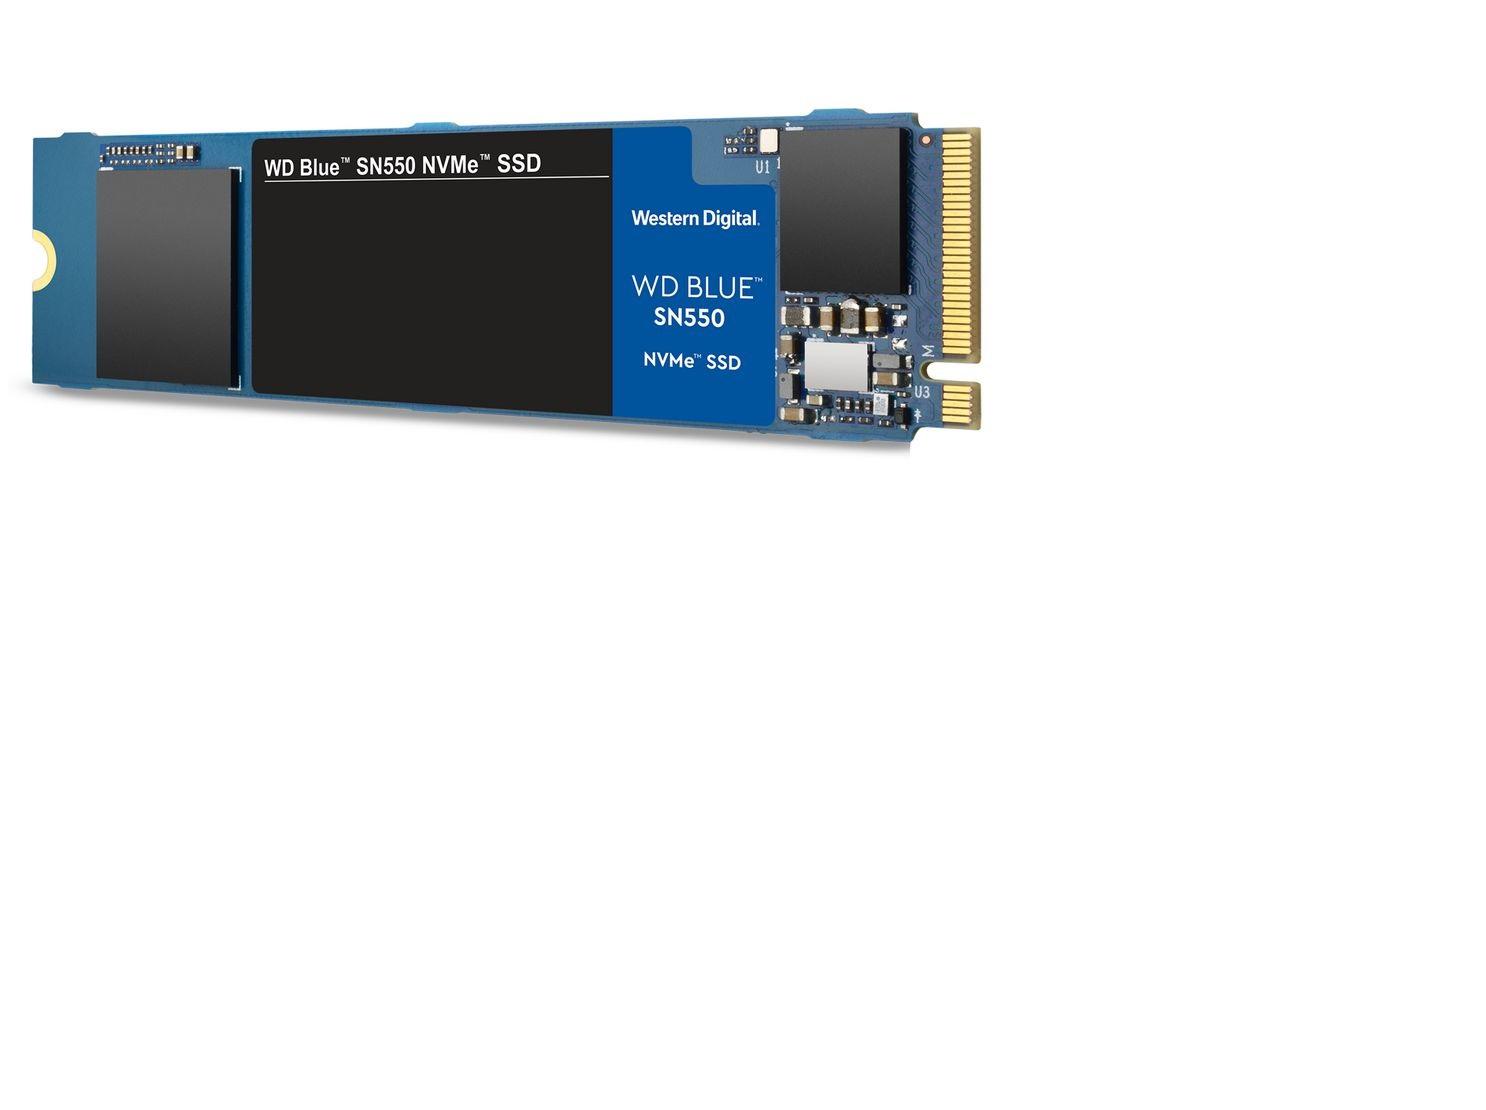 Ssd Wd 250Gb Blue M.2 2280 Sn550 Nvme Pcie Wds250g2b0c